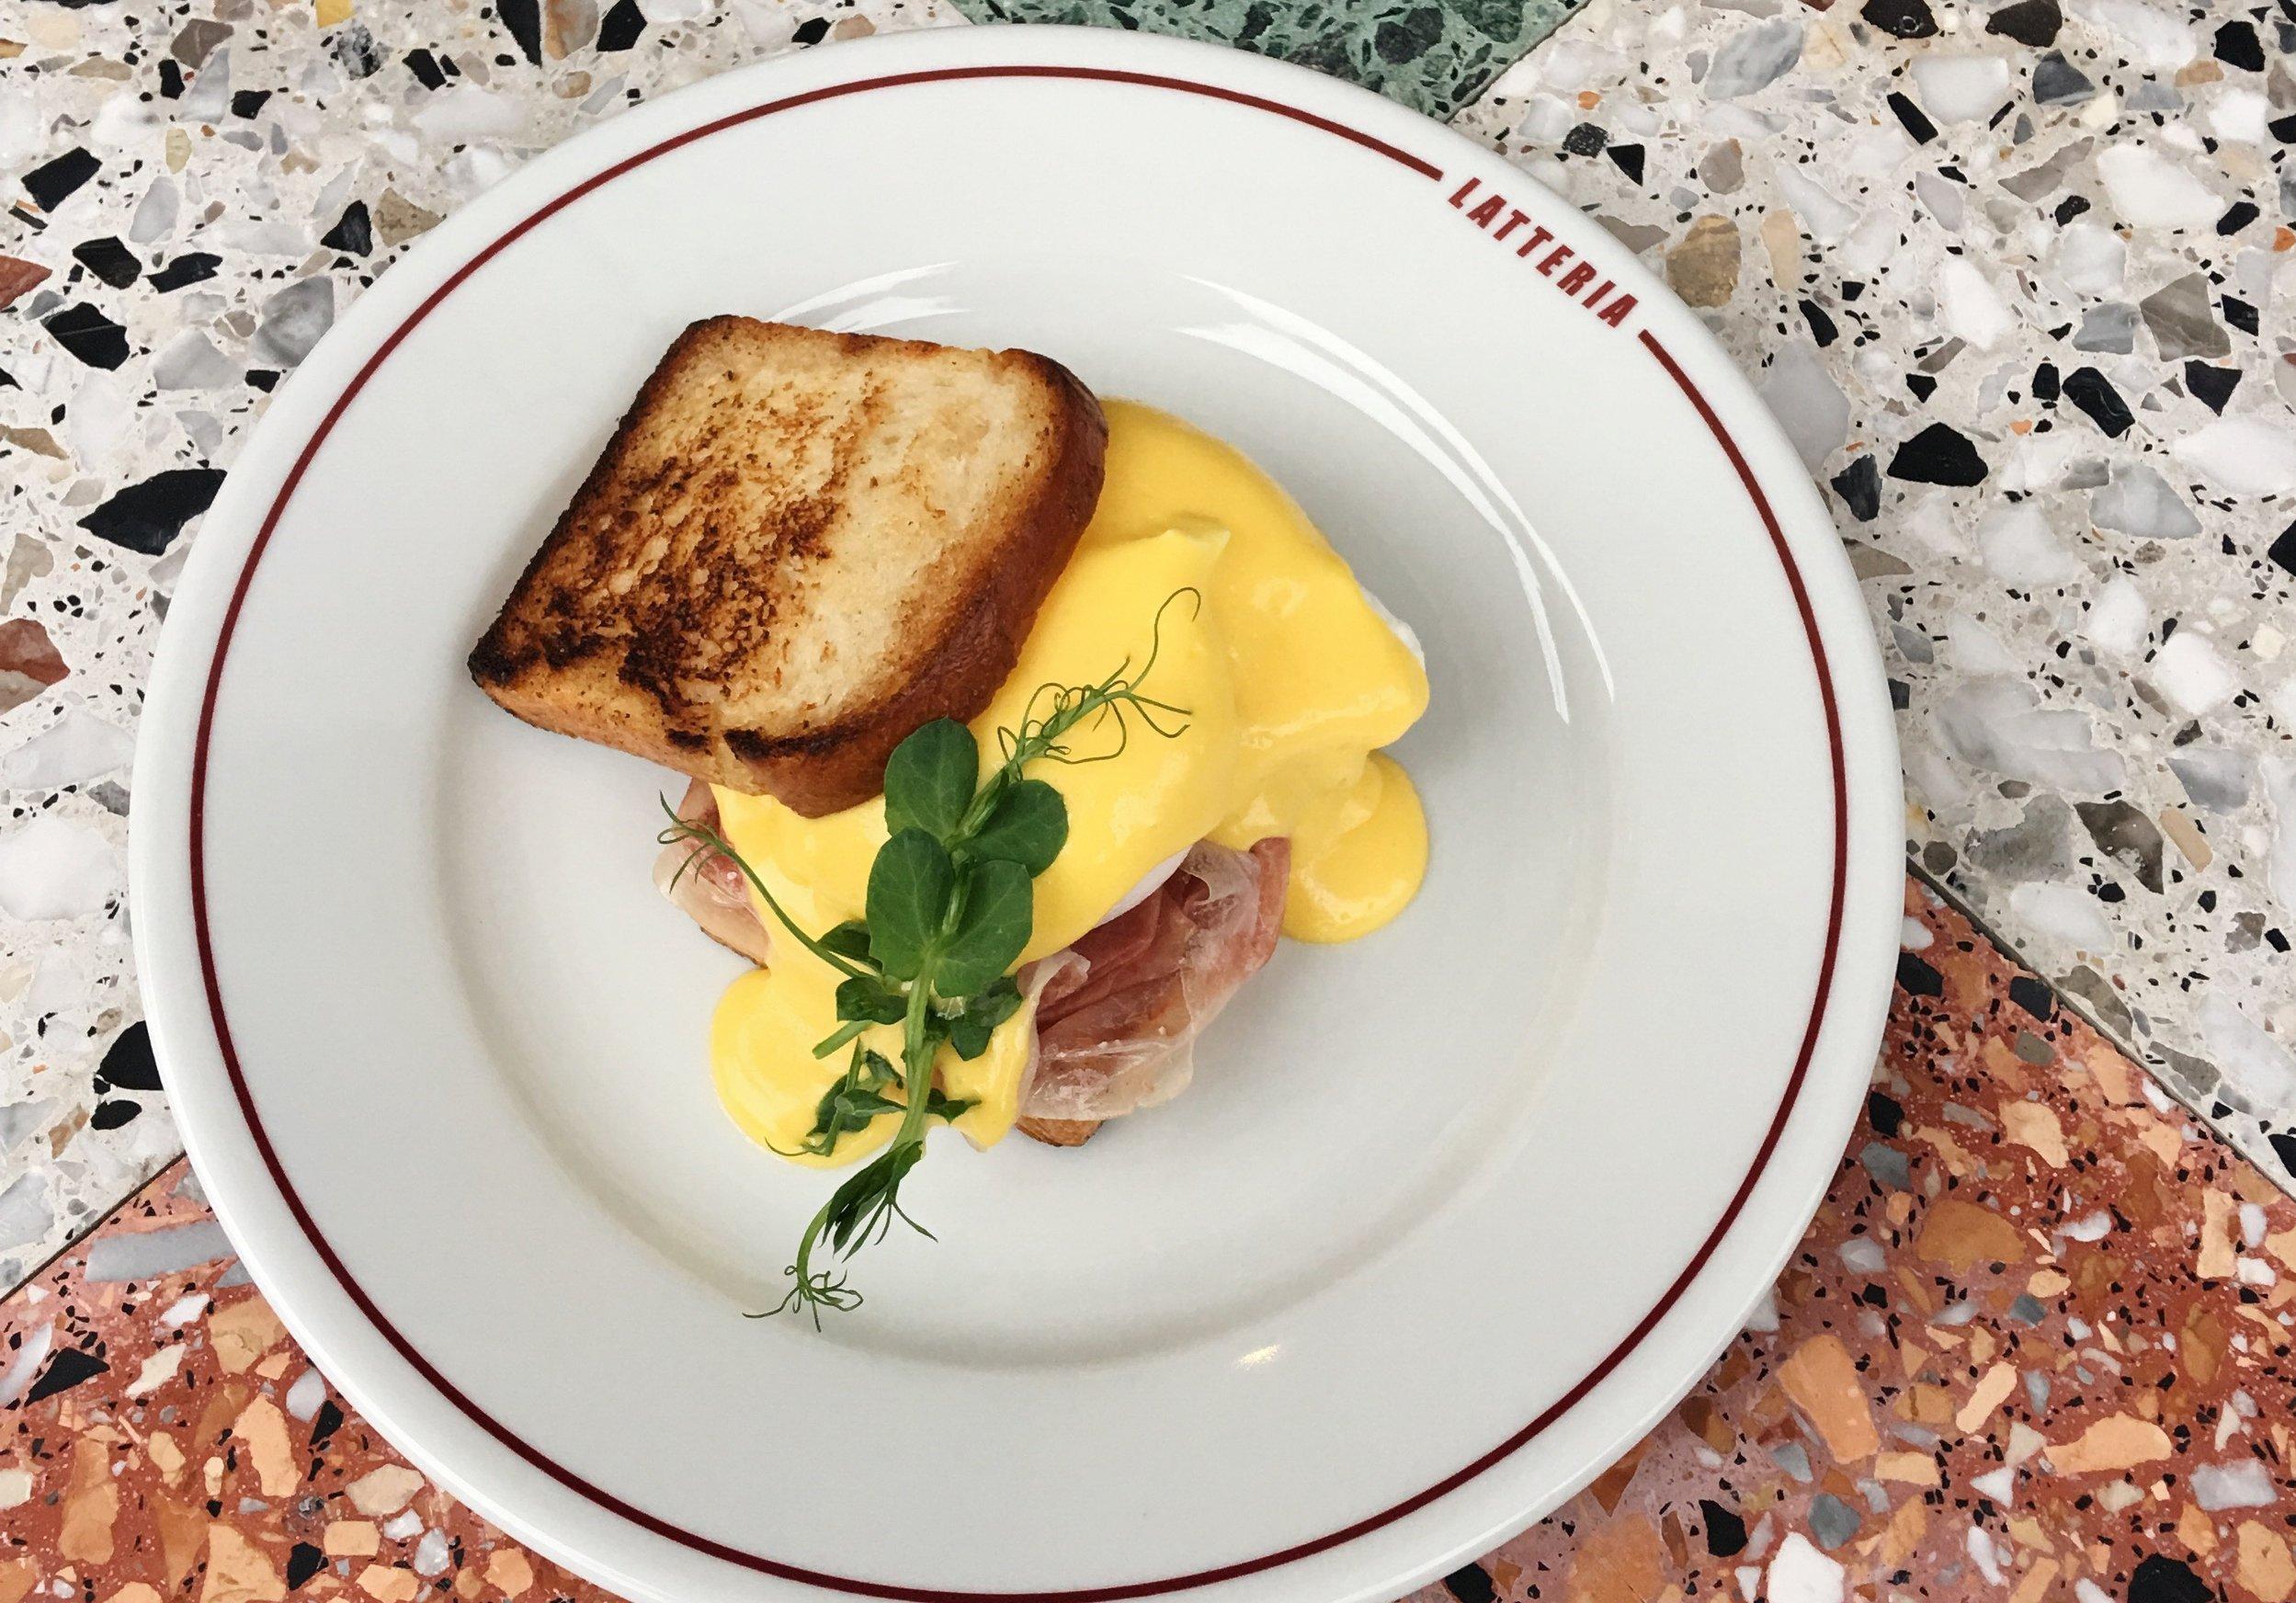 Serial Italian Restaurateur Brings Parma Ham Eggs Benedict to North London